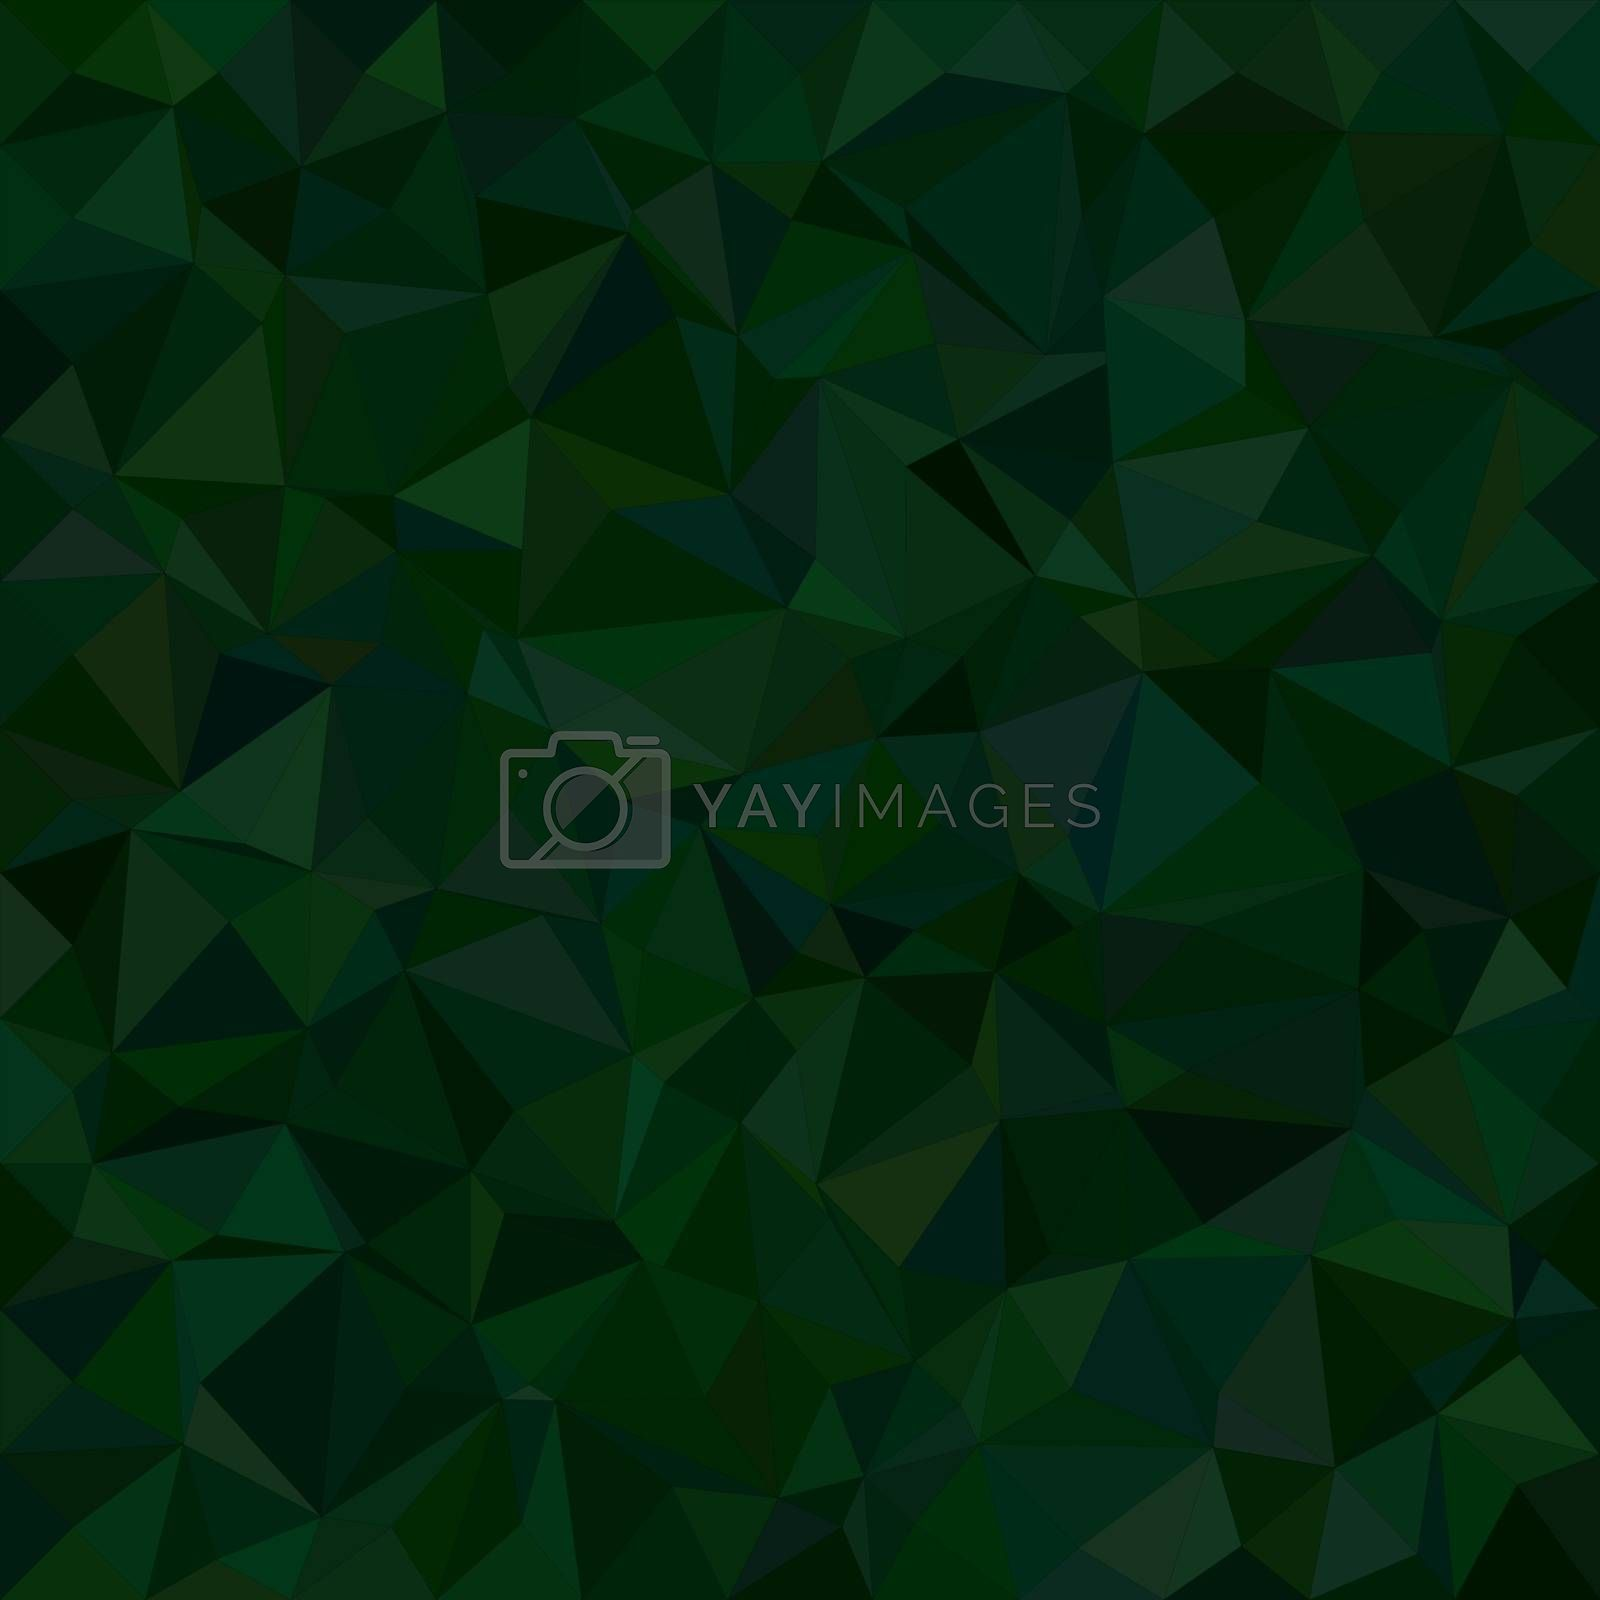 Dark green irregular triangle mosaic vector background design